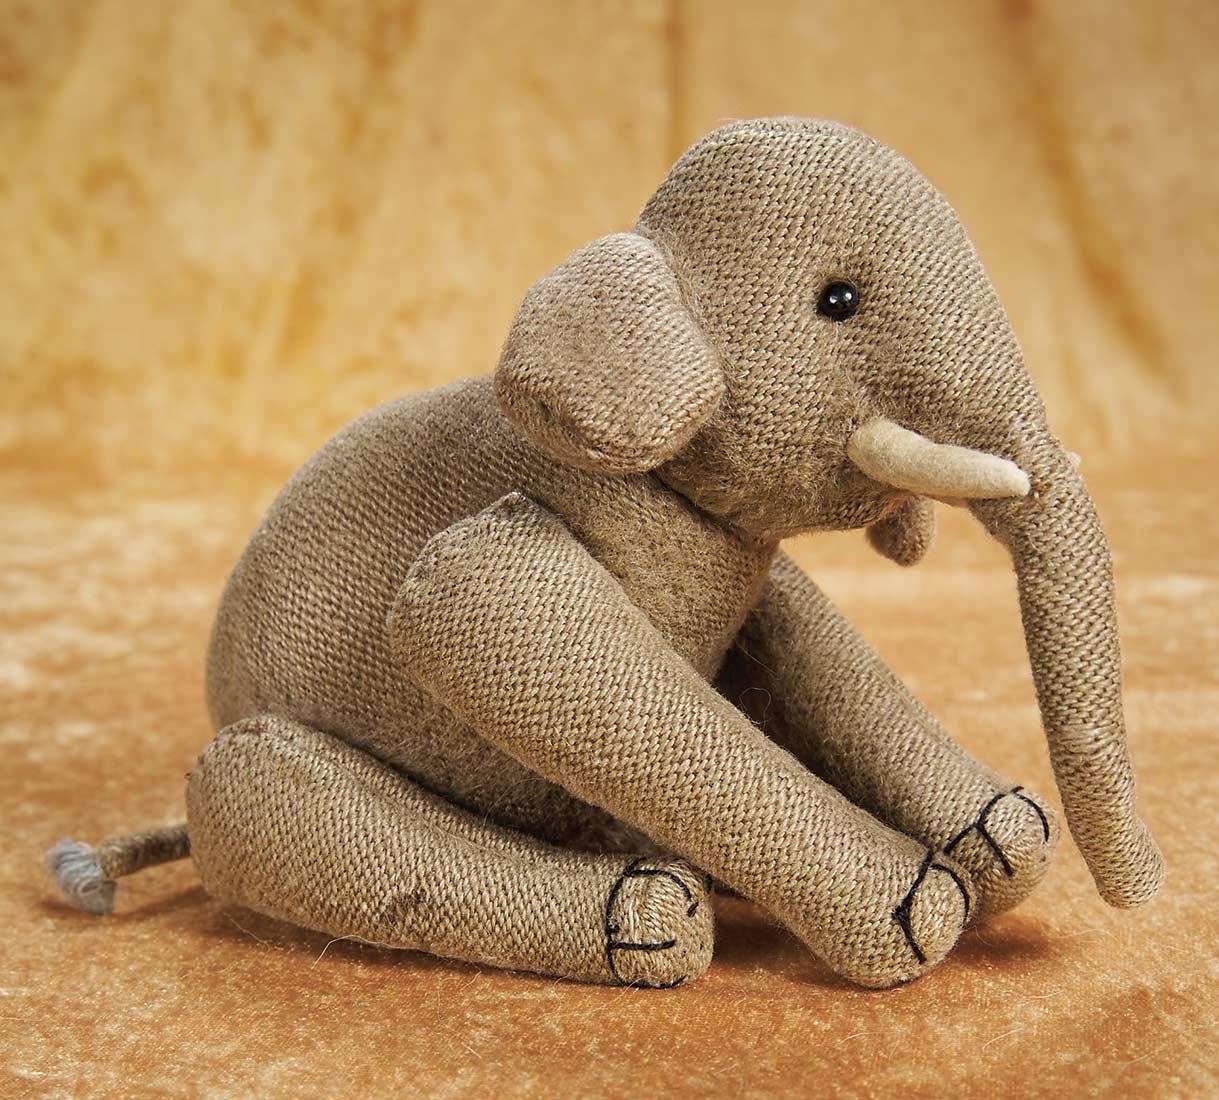 мишки тедди, мишки, тедди,teddy, teddybears, elephant,Steiff